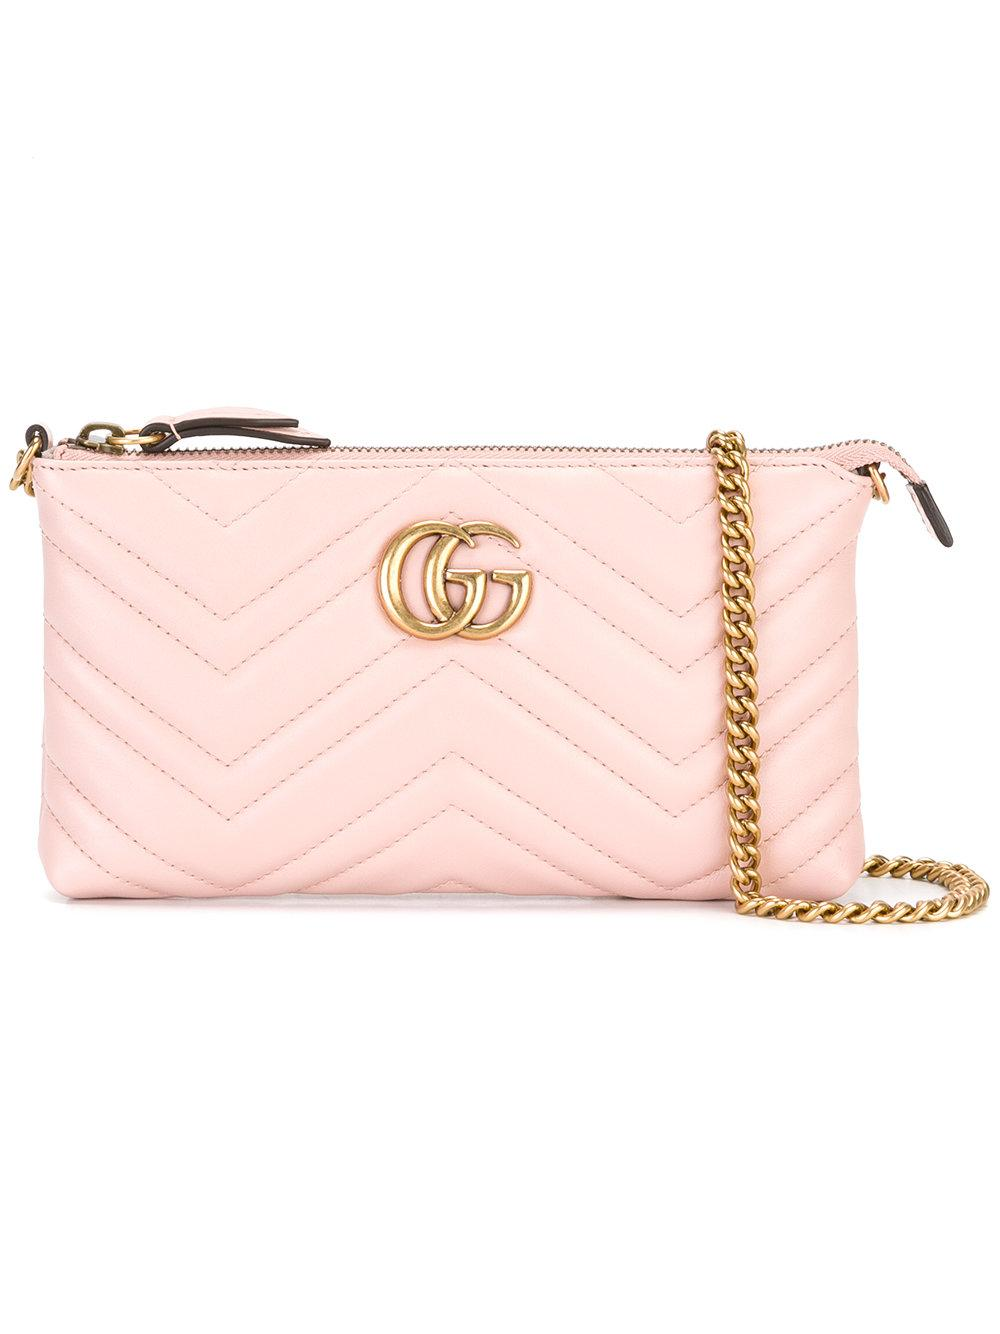 810a71672733 Gucci Marmont Belt Bag Pink